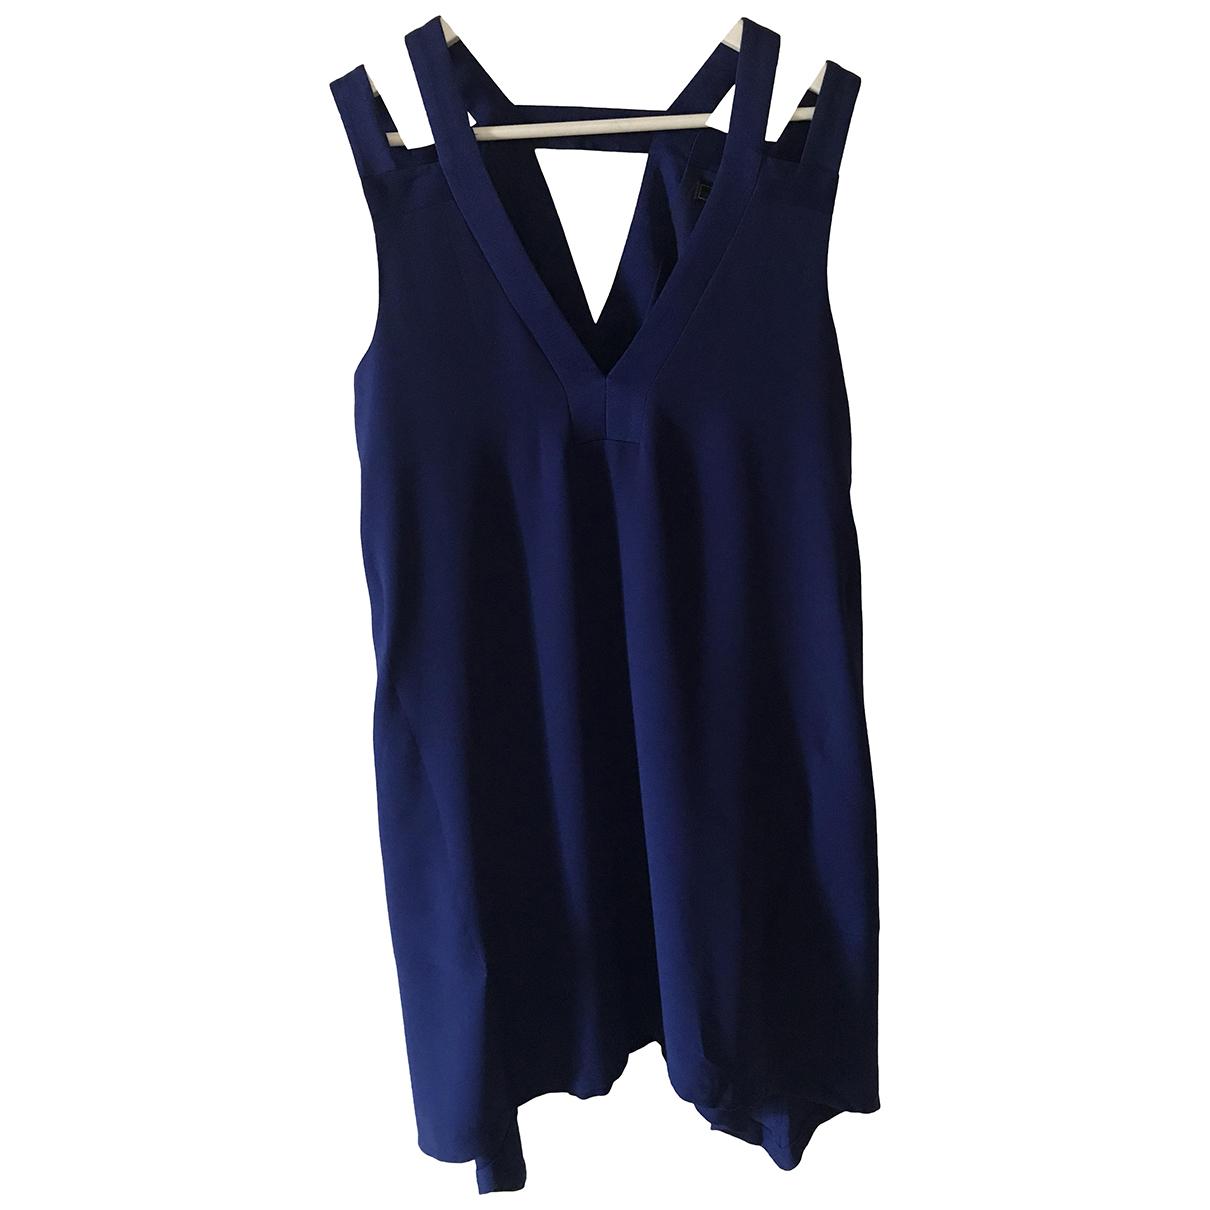 Bcbg Max Azria \N Blue dress for Women 36 FR